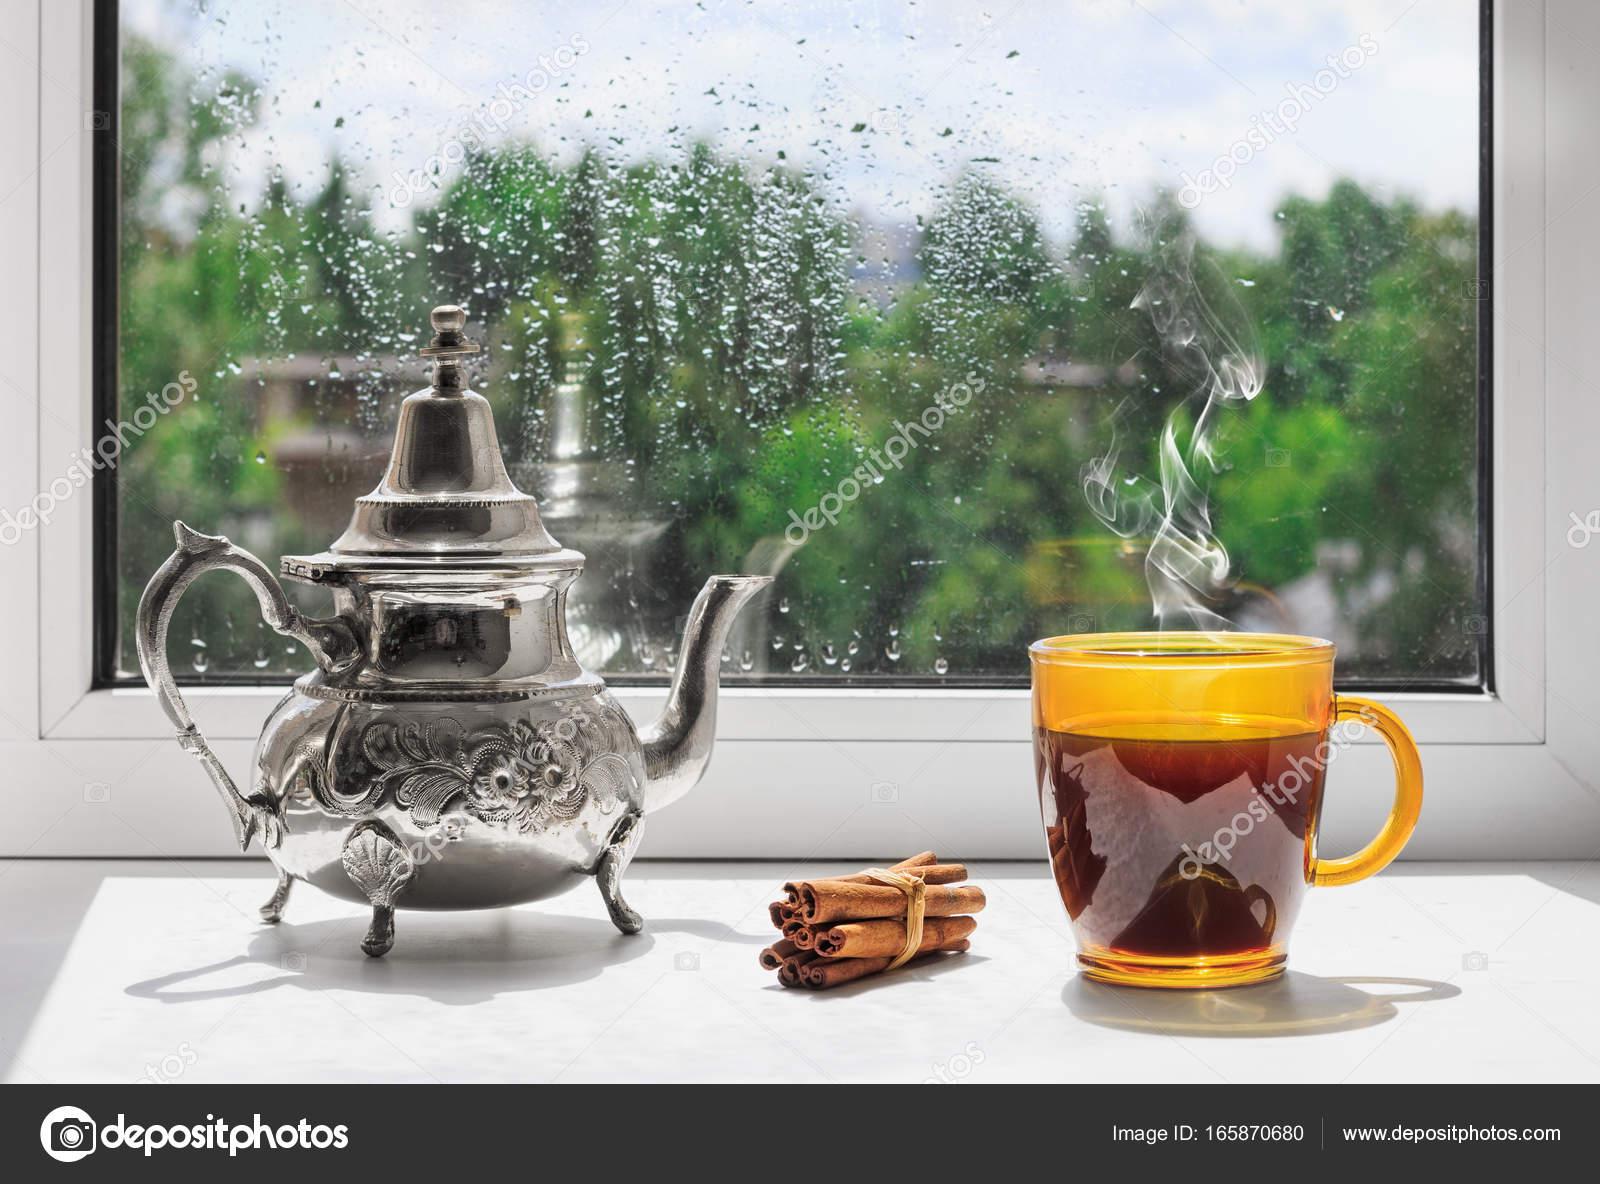 Cup Of Hot Coffee On The Windowsill. Outside The Window The Rain. Rainy  Weather Behind The Window. U2014 Photo By IgorBukhlin